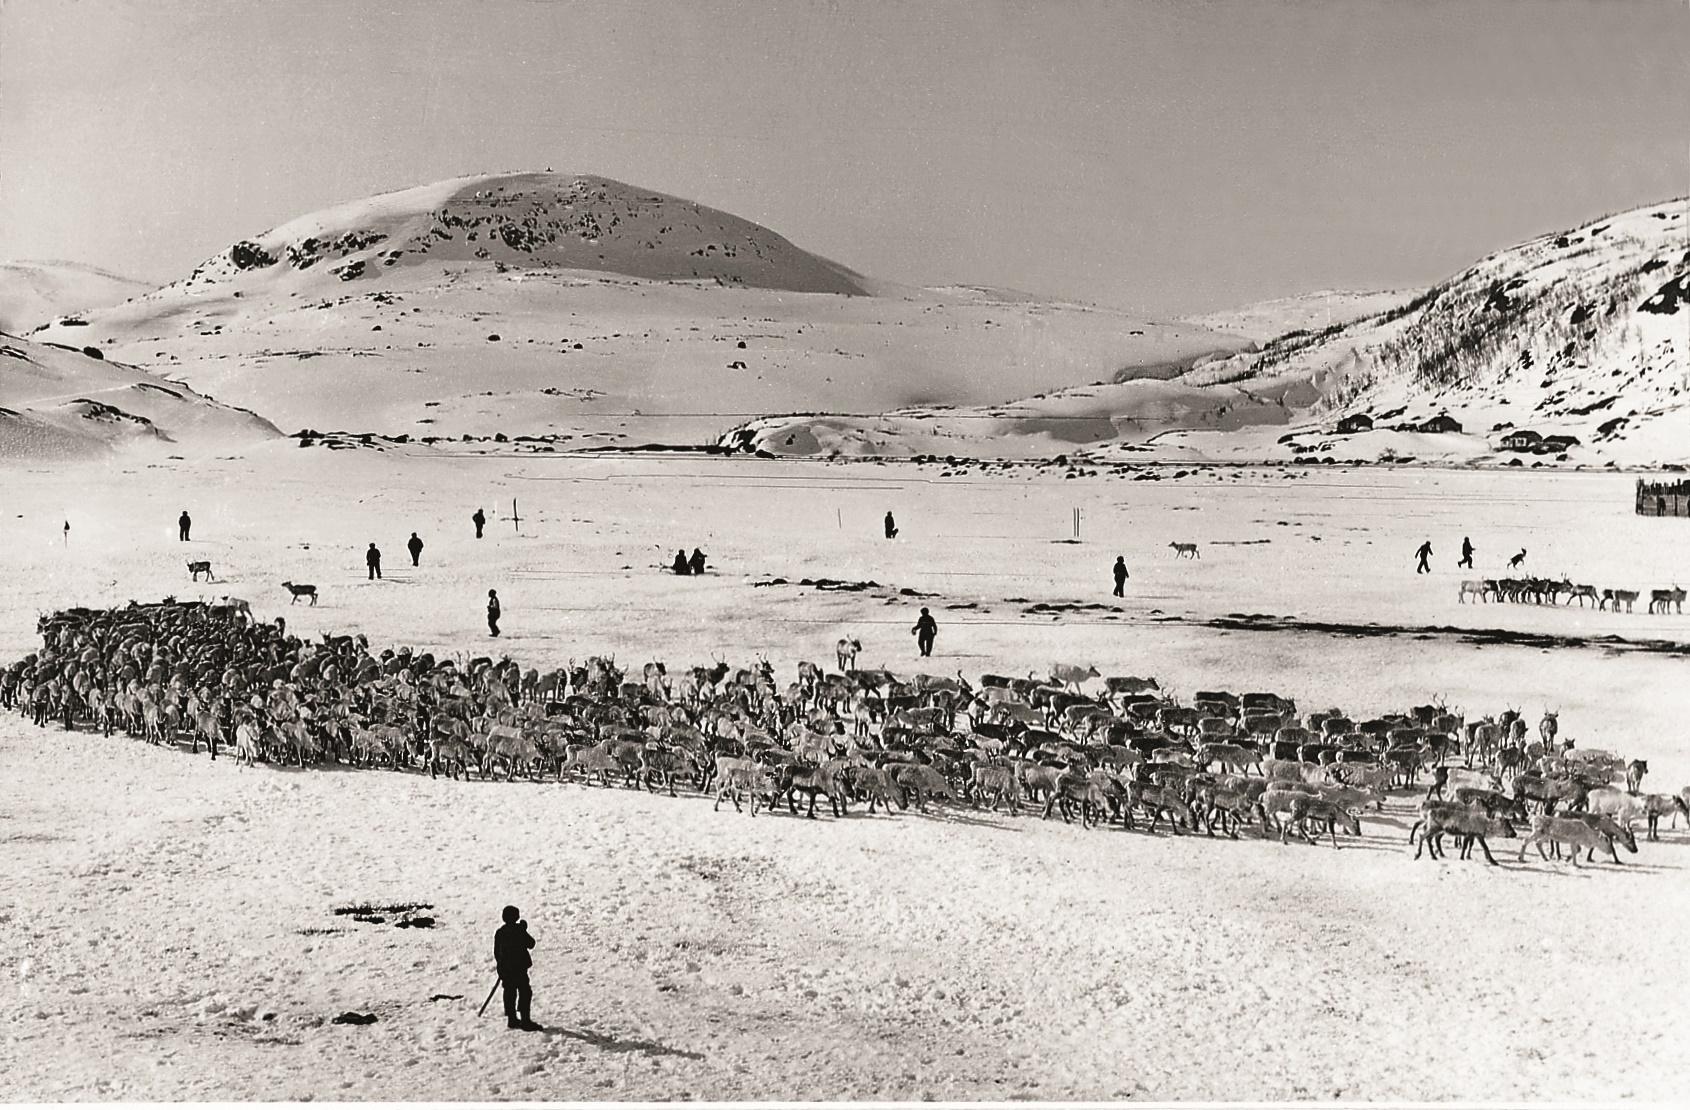 Skiljing av reinsflokk i Øyna, Hardangervidda, kring 1913